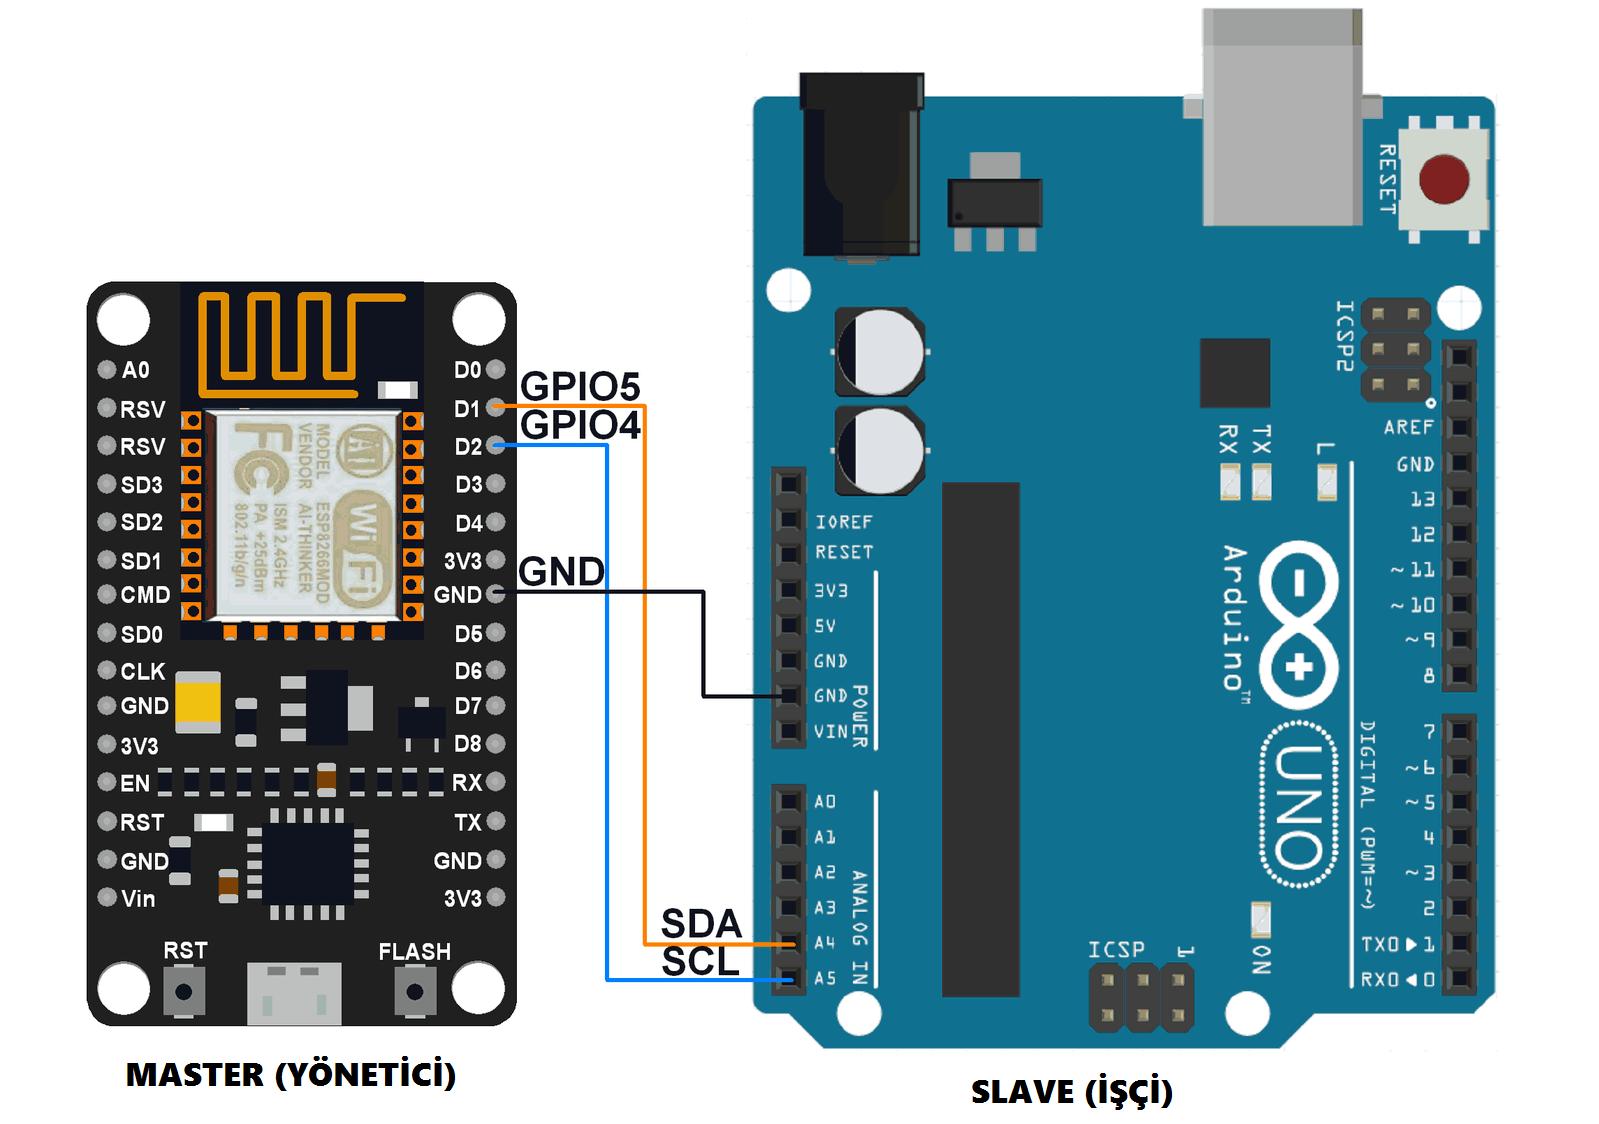 Arduino_NodeMCU_I2C_Interface Wiring Vs Arduino on lamp post photocell wiring, dht11 wiring, mac mini wiring, sensor wiring, servo wiring, 3d printer wiring, power wiring, lcd wiring, ds18b20 wiring, i2c wiring,